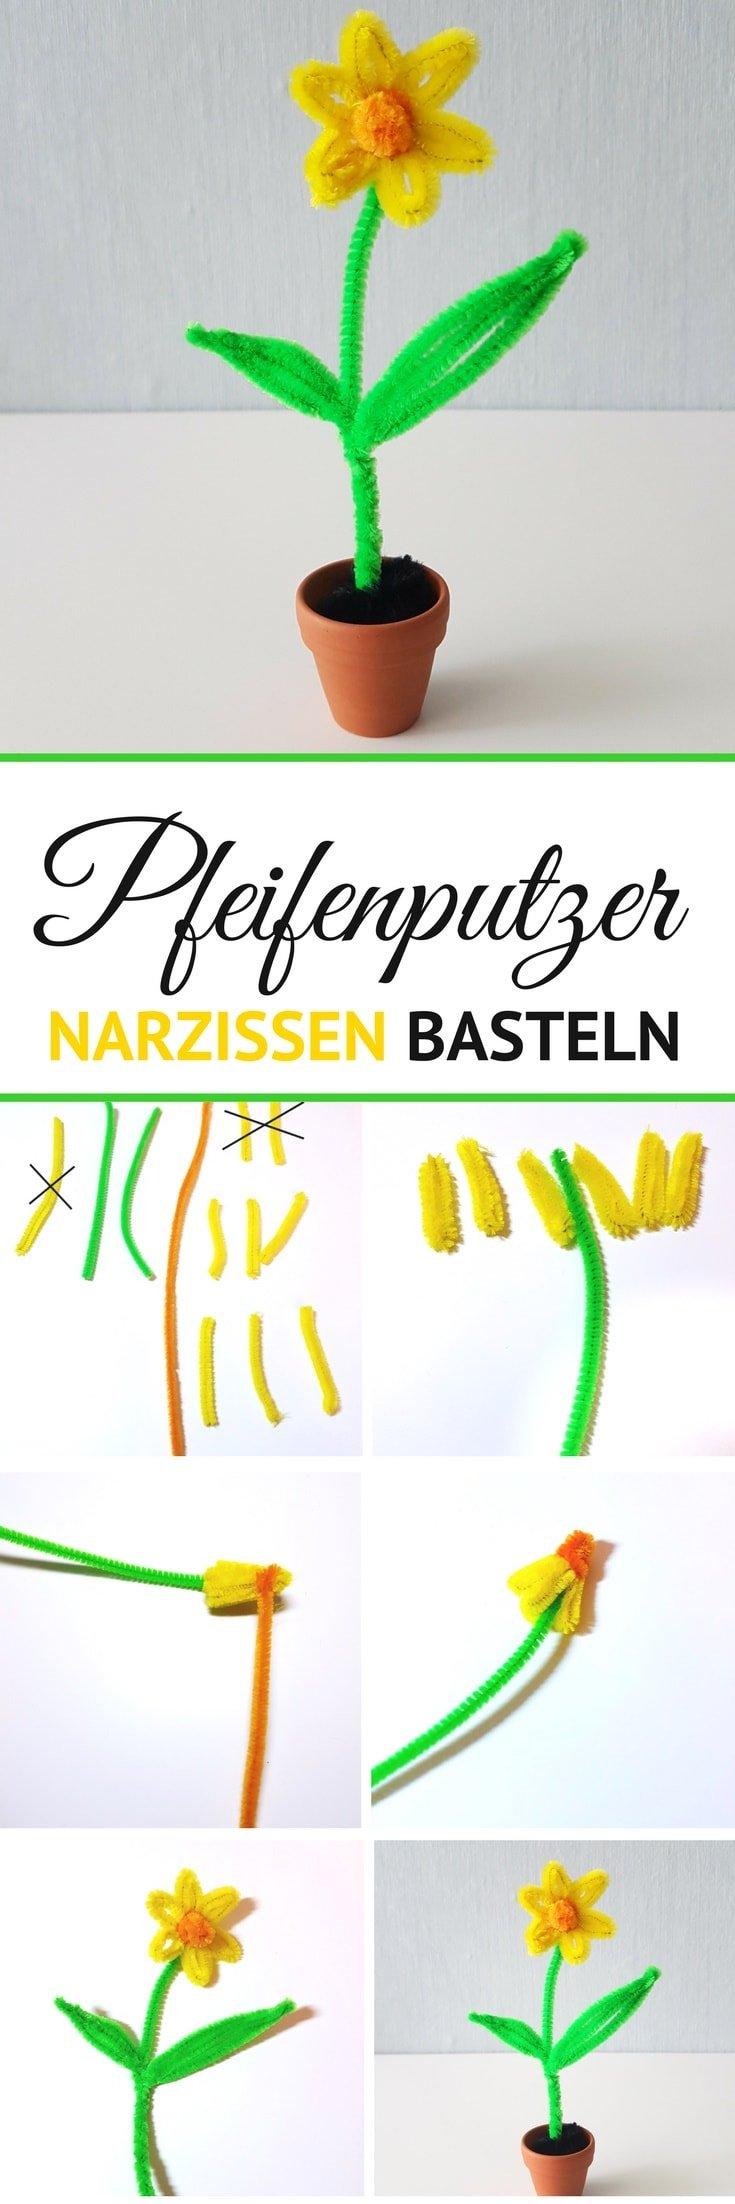 DIY Anleitung Pfeifenputzer Osterglocken basteln